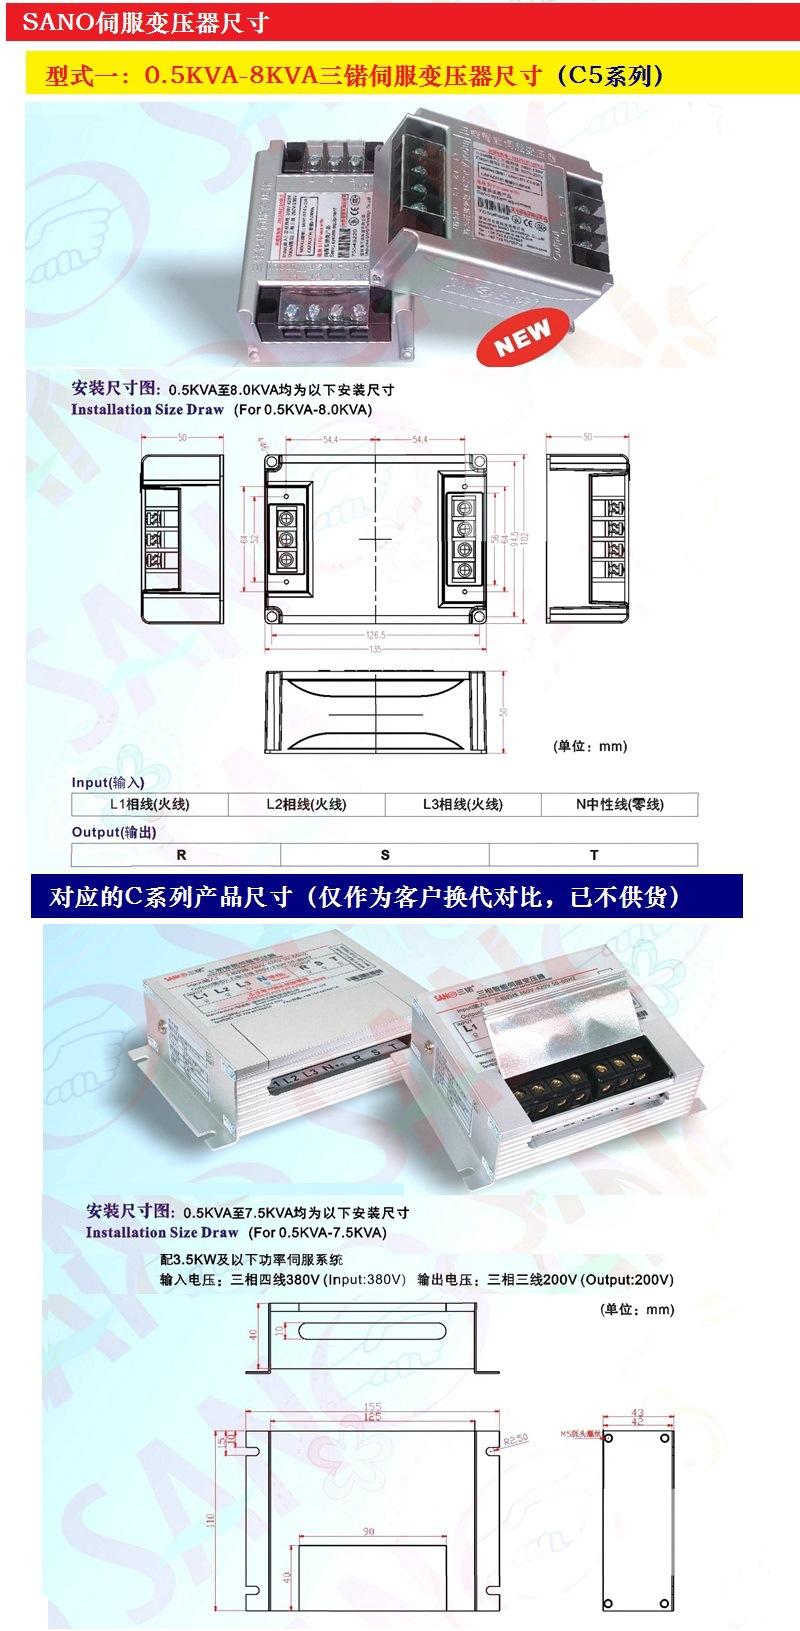 IST-C5-005伺服变压器0.5KVA三锘SANO伺服电子变压器380V转200V示例图3